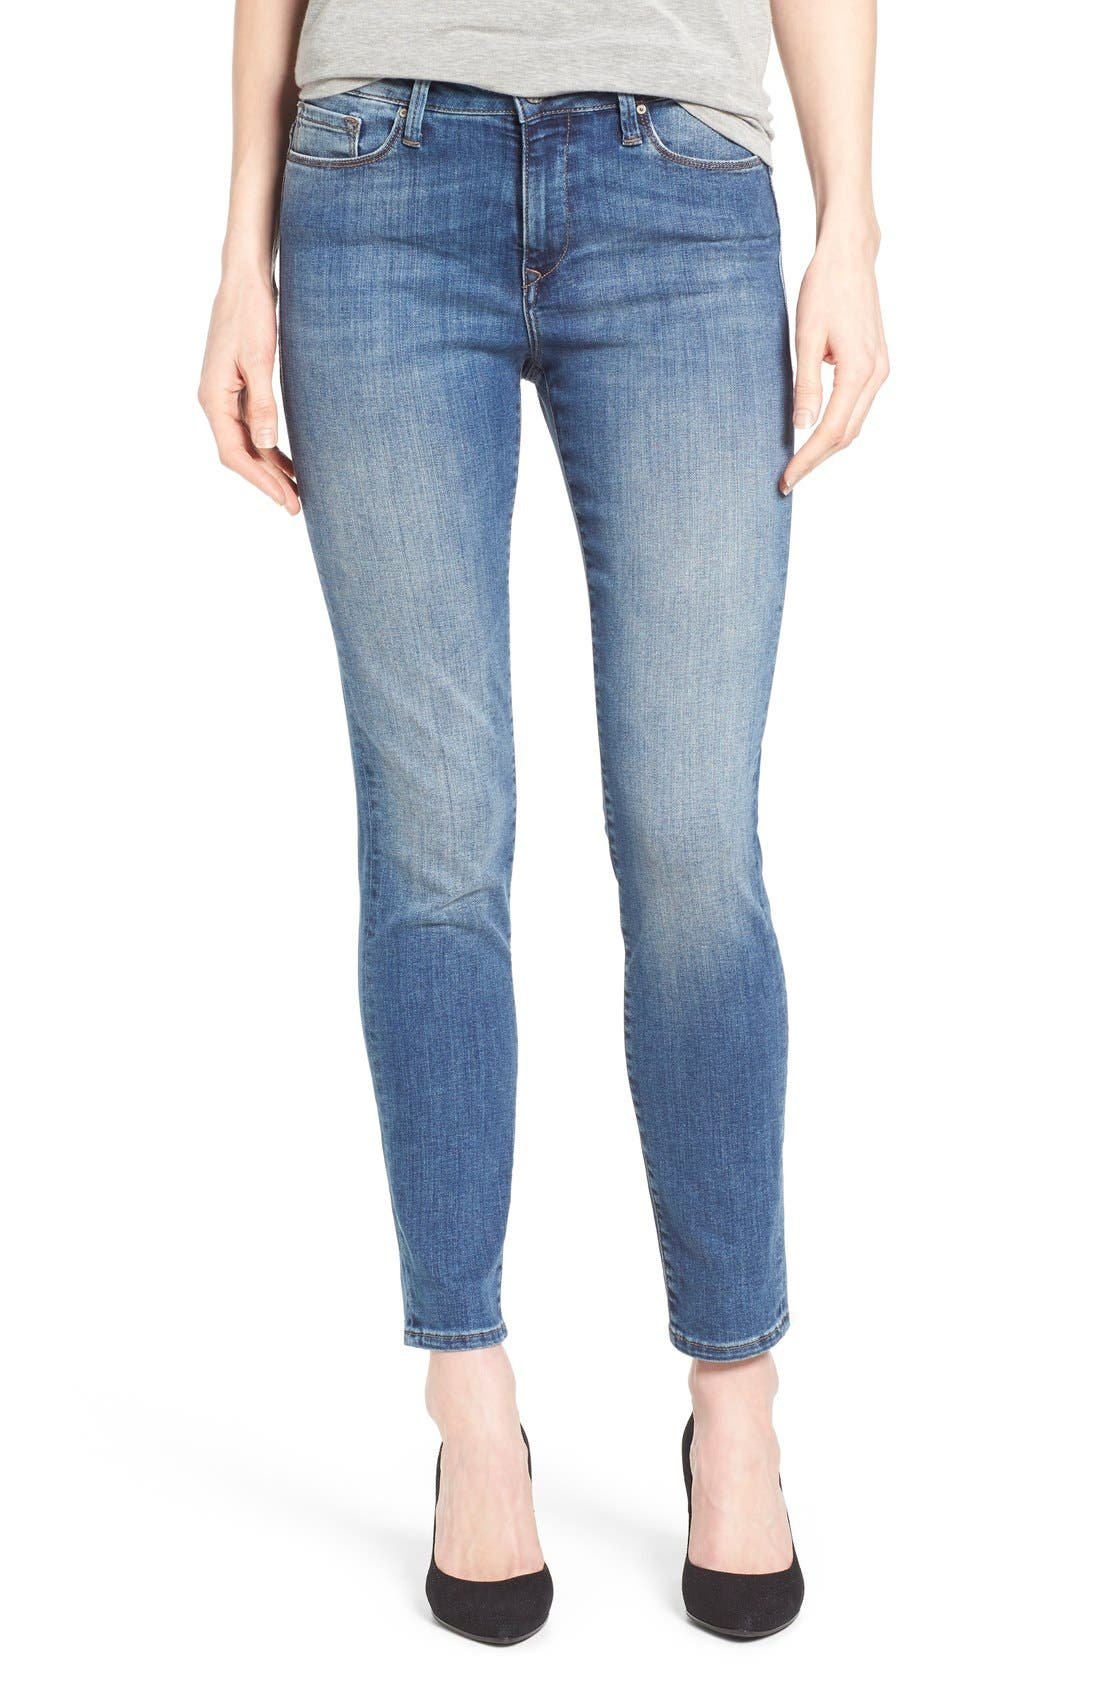 MAVI JEANS 'Alissa' Stretch Slim Ankle Jeans